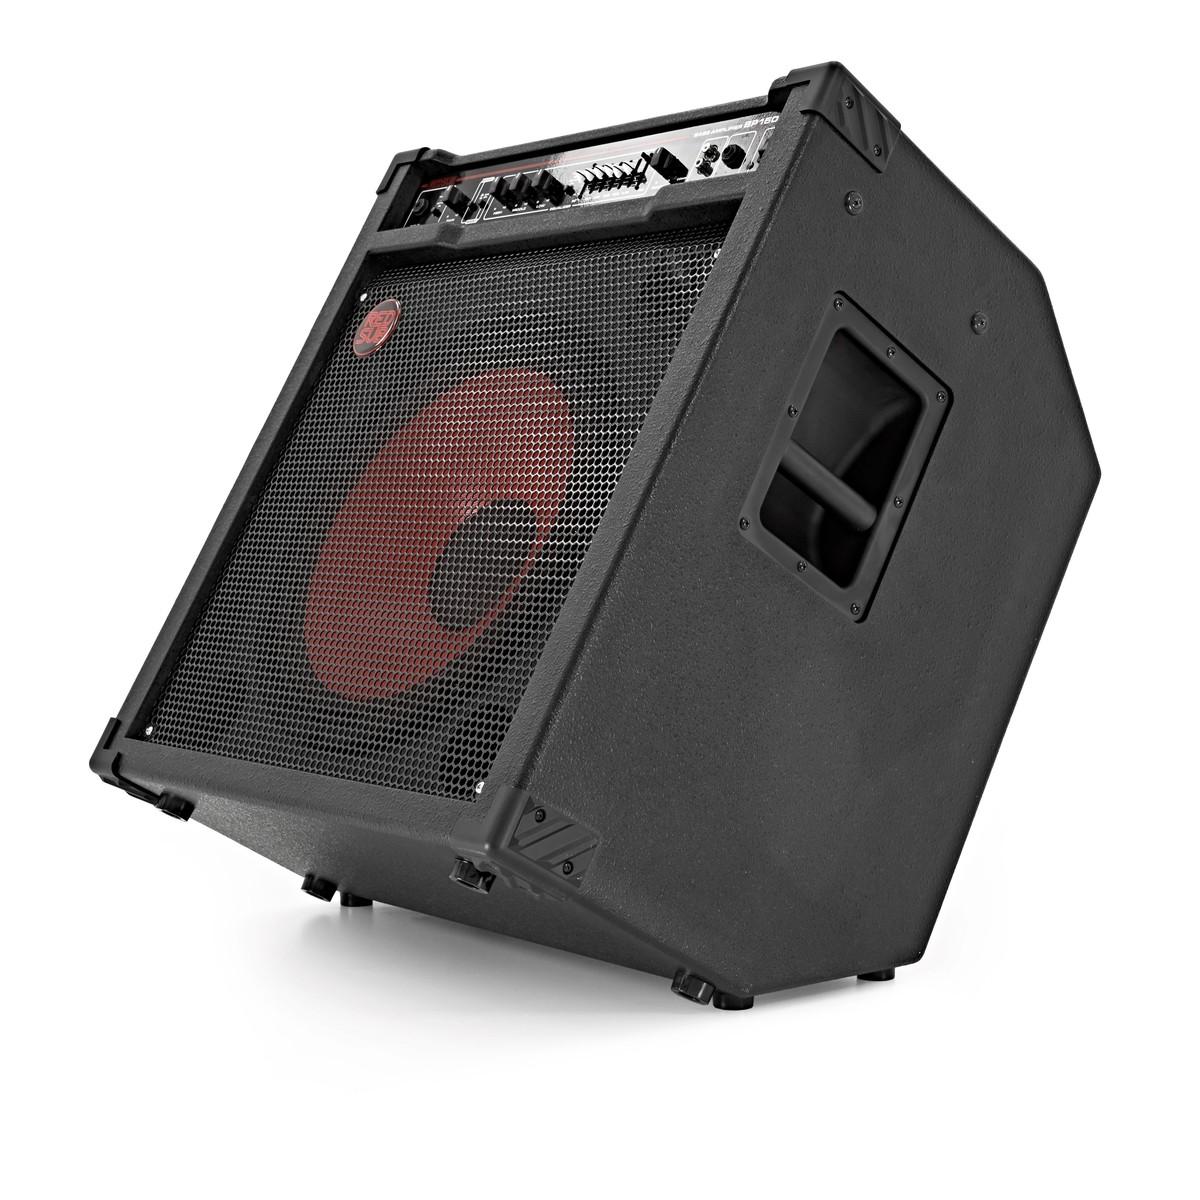 redsub bp150plus 150w bass guitar amplifier at. Black Bedroom Furniture Sets. Home Design Ideas